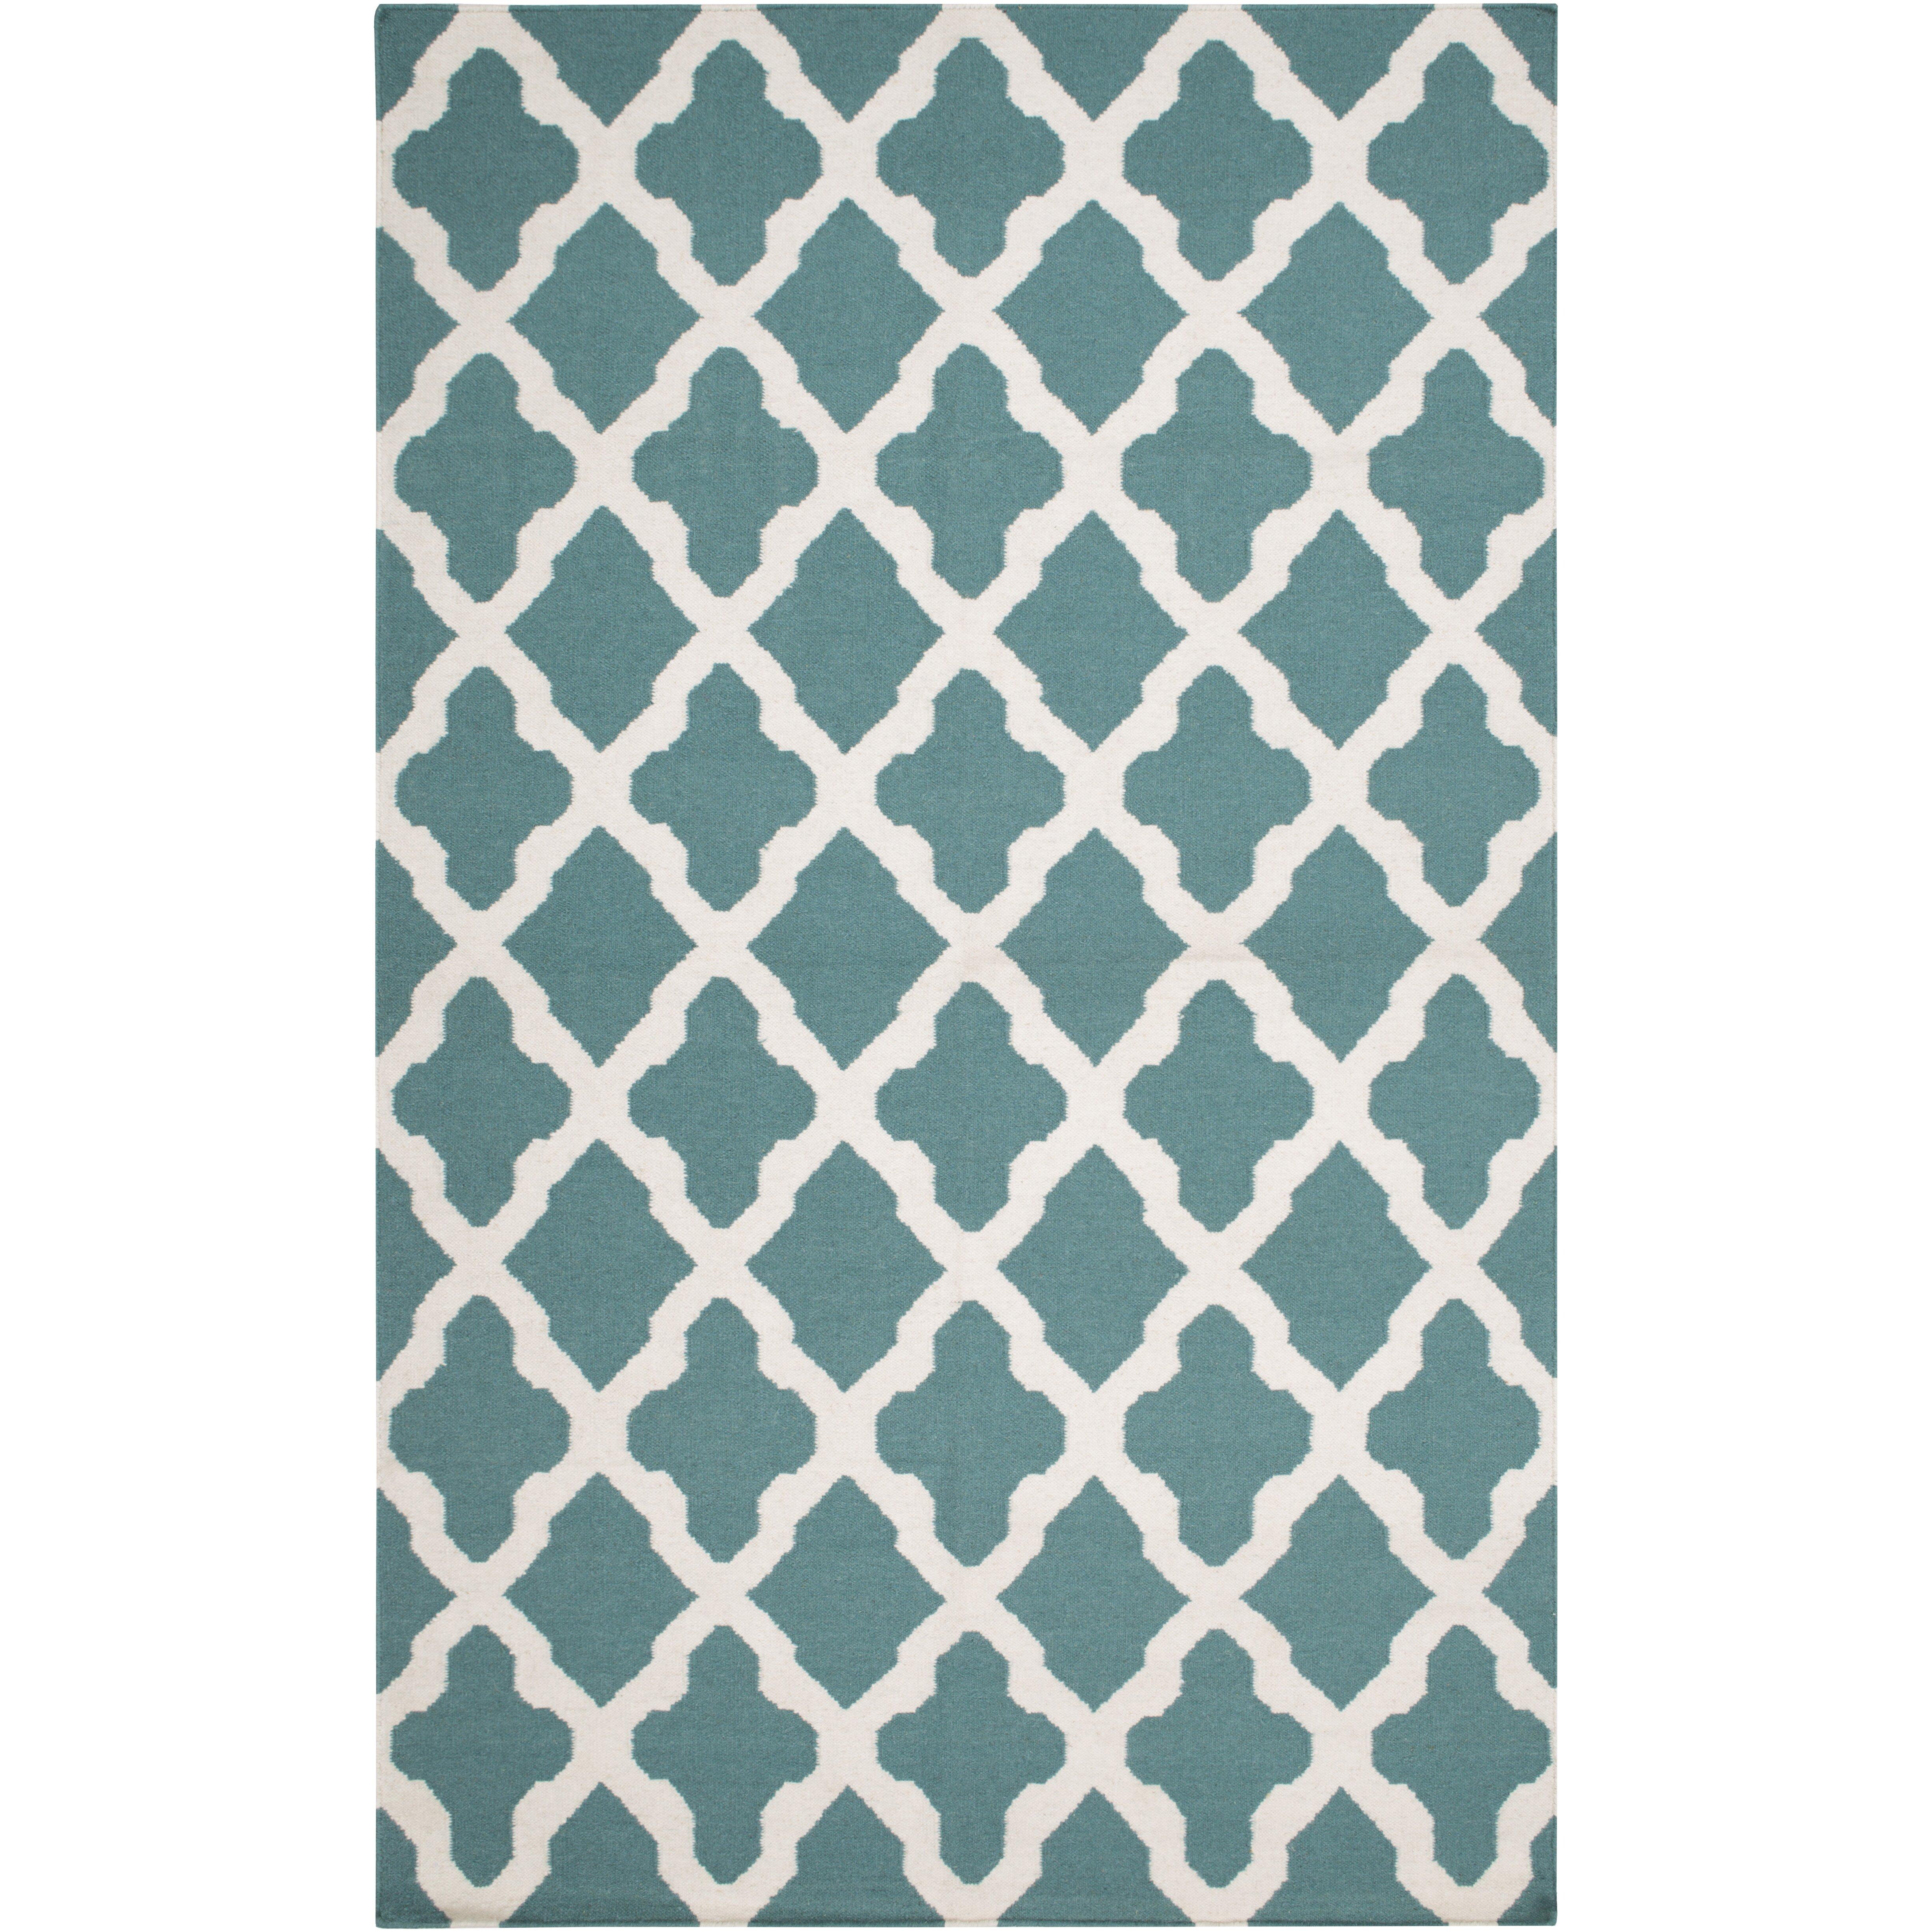 Artistic Weavers York Teal Geometric Olivia Area Rug Reviews Wayfair